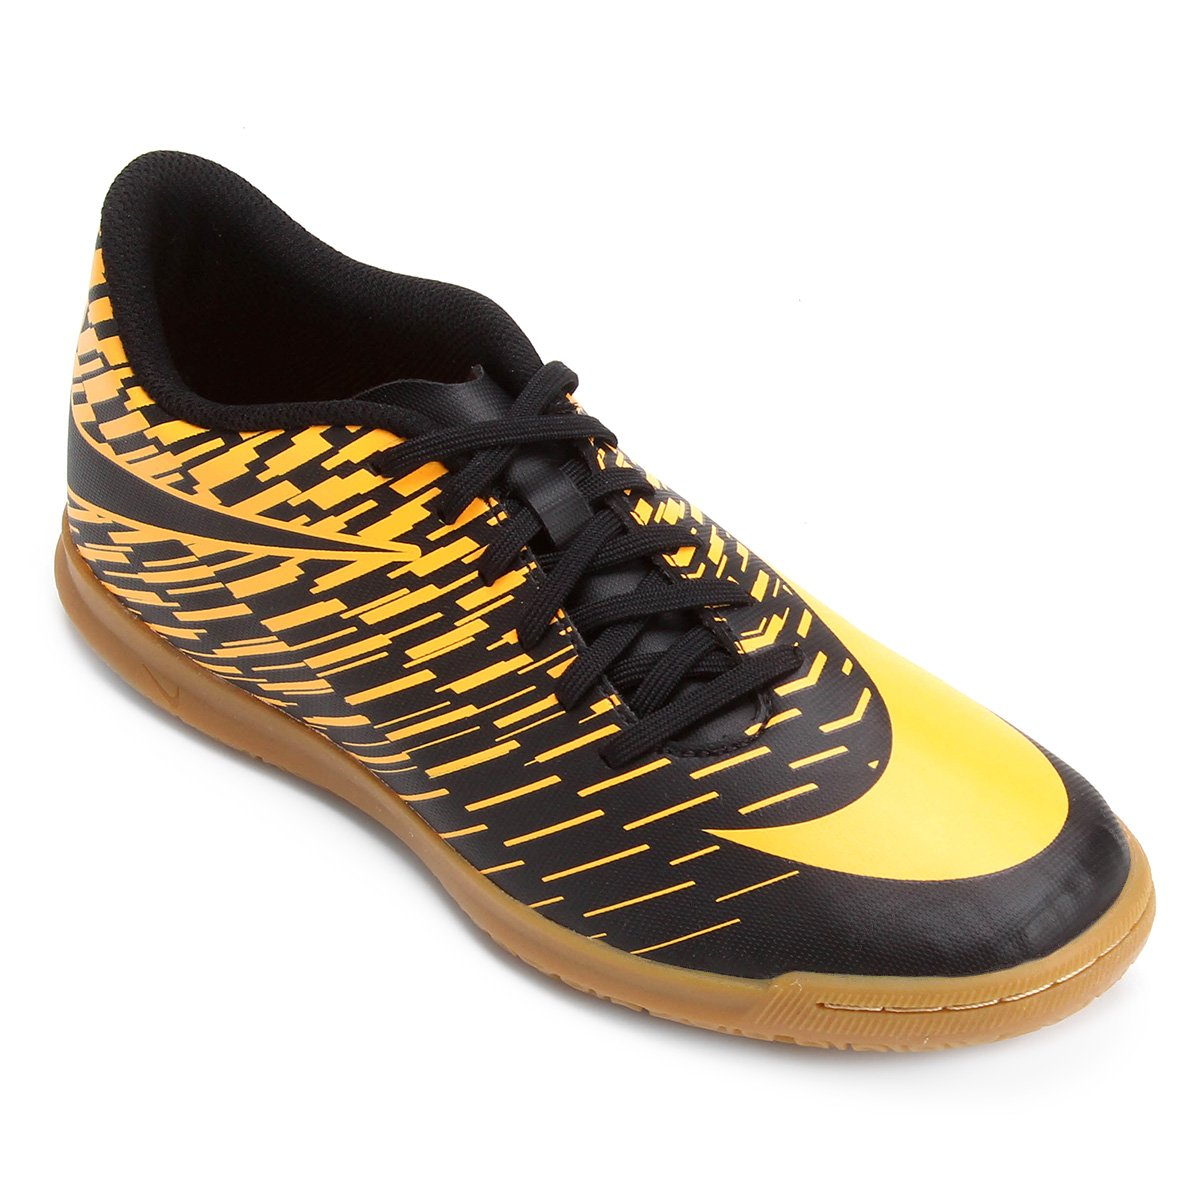 d8aceba9ba25f Chuteira Futsal Nike Bravata 2 IC - Compre Agora